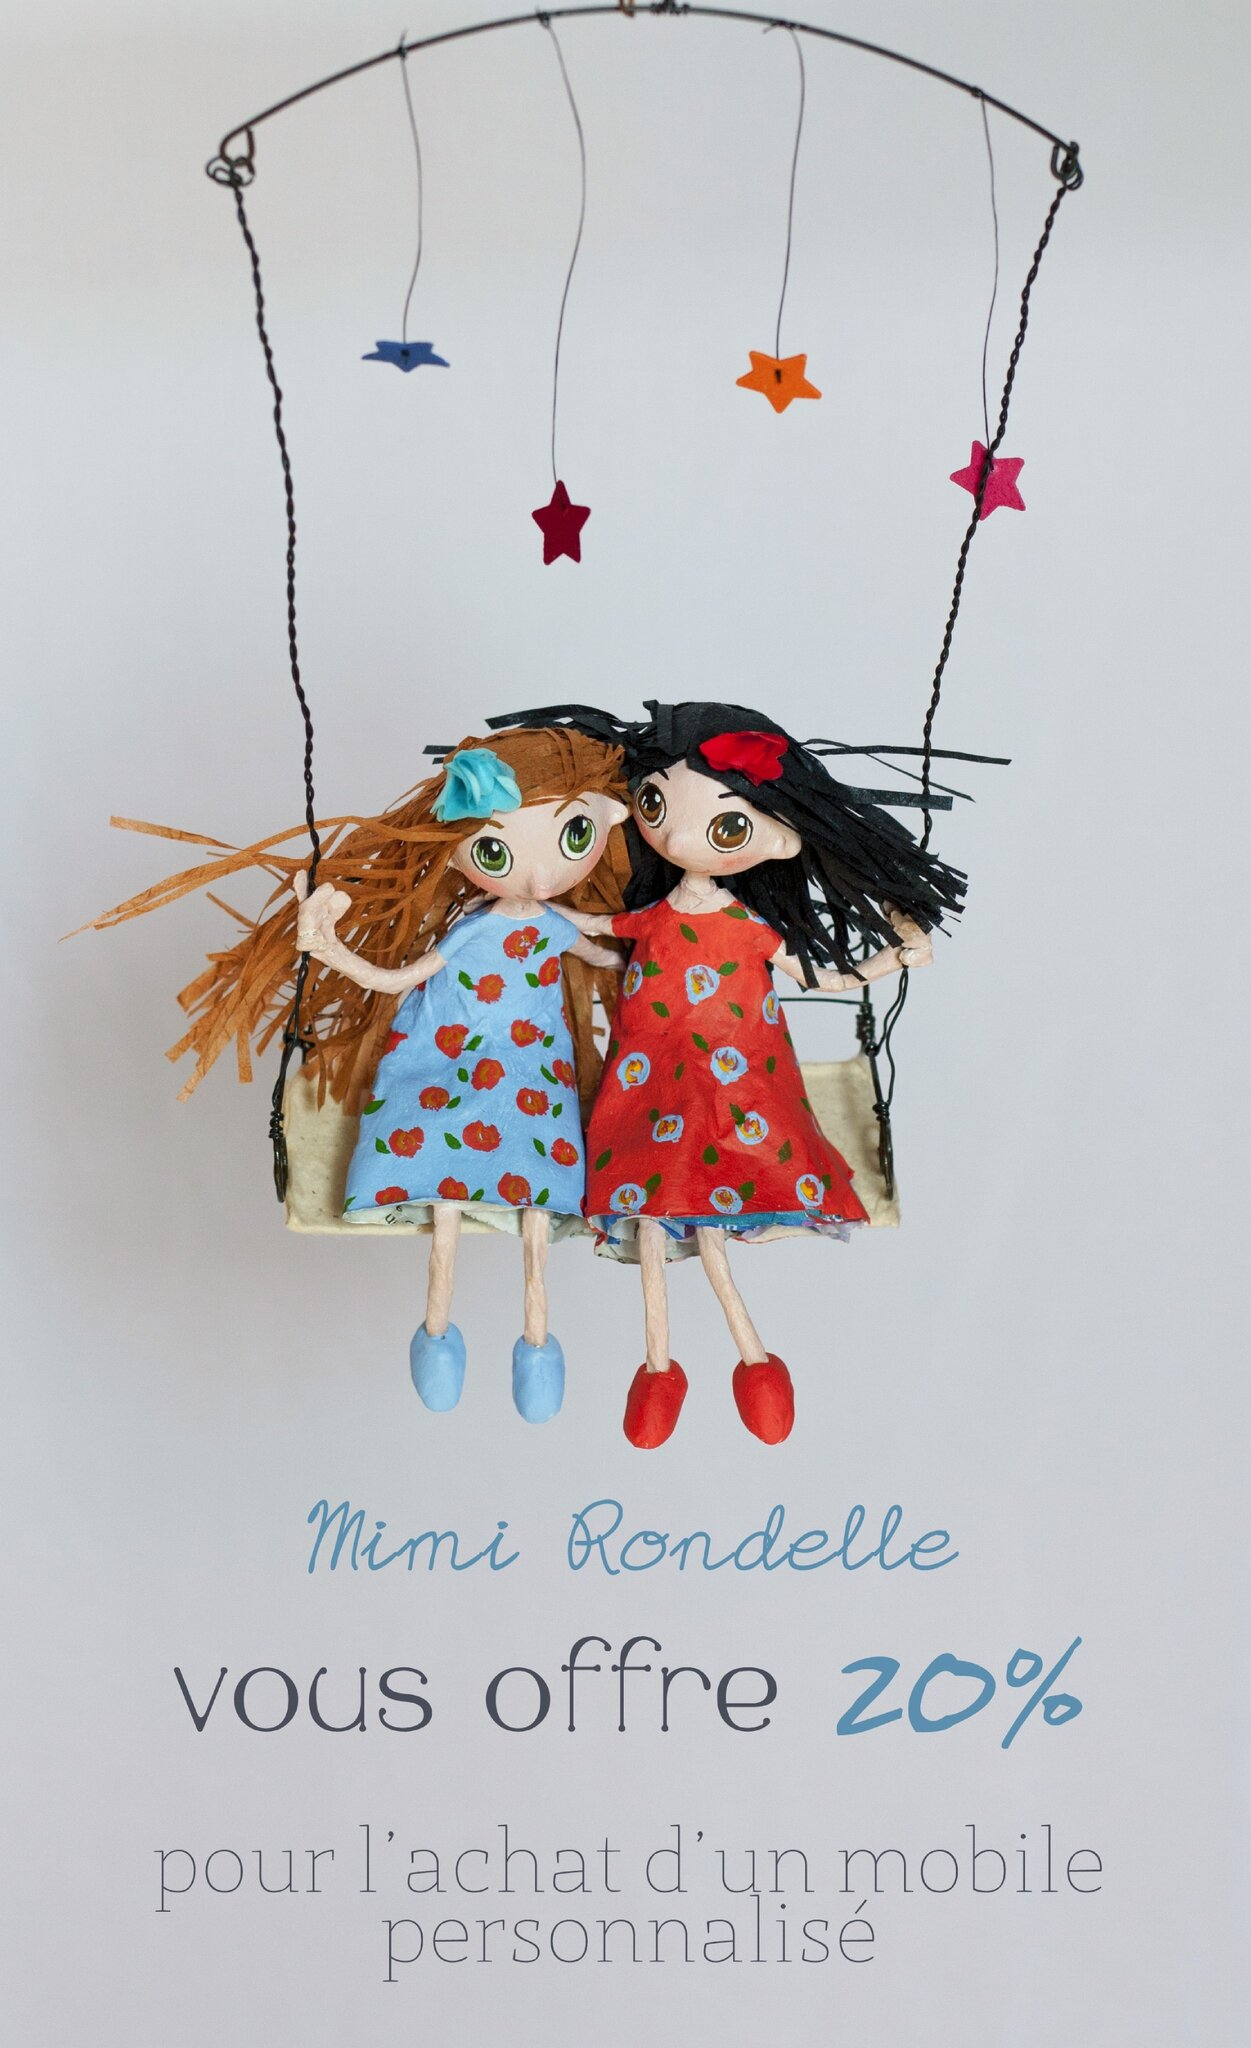 Promo Mimi Rondelle Dec 2014